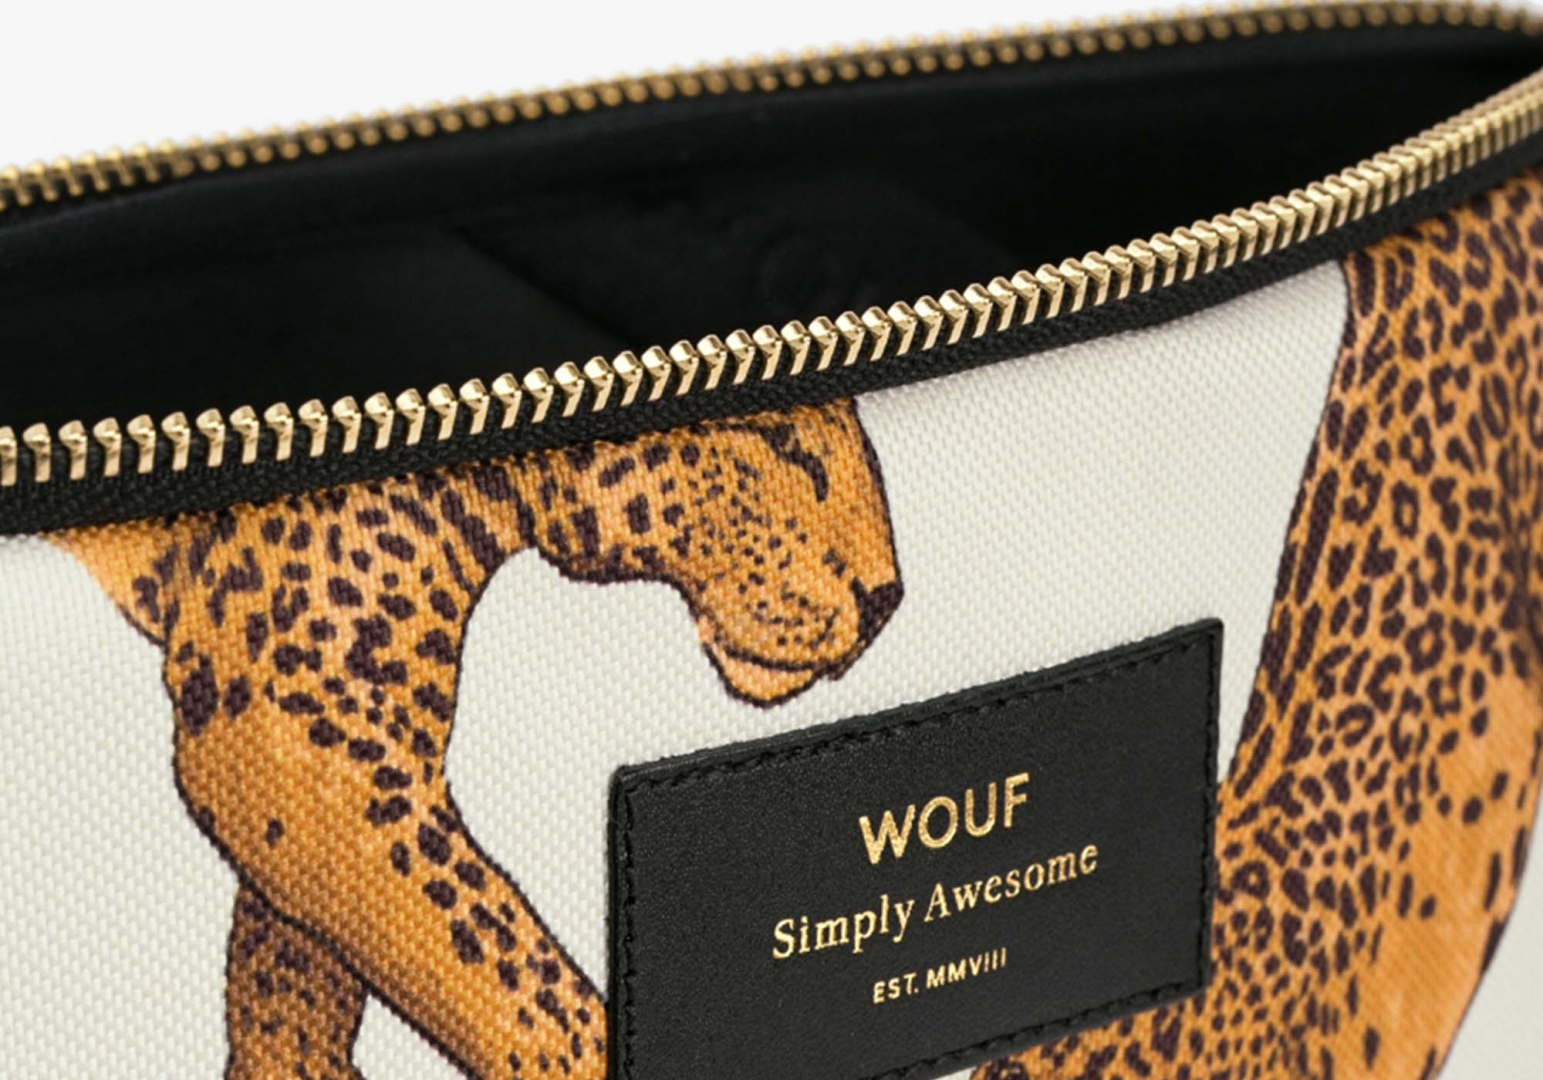 Housse Leopard macbook 13' - WOUF